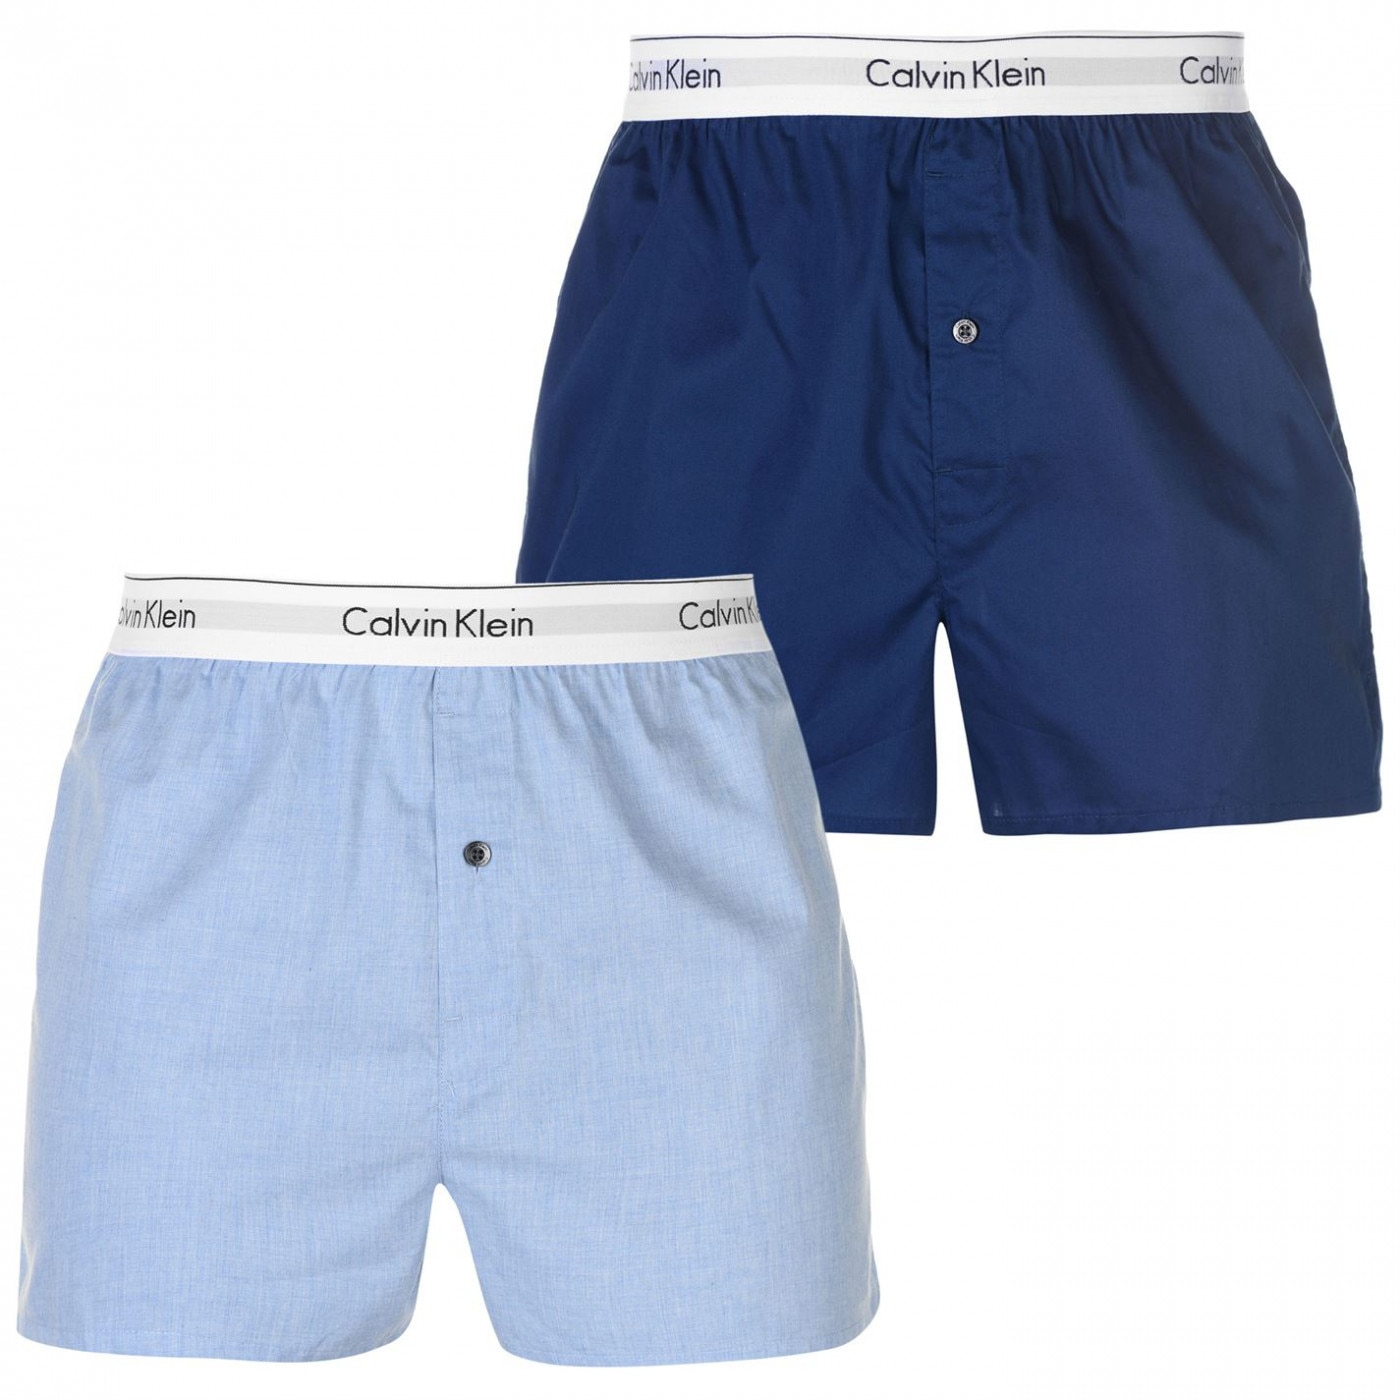 db5f224eb Predaj skončil - Calvin Klein Underwear Modern Boxer